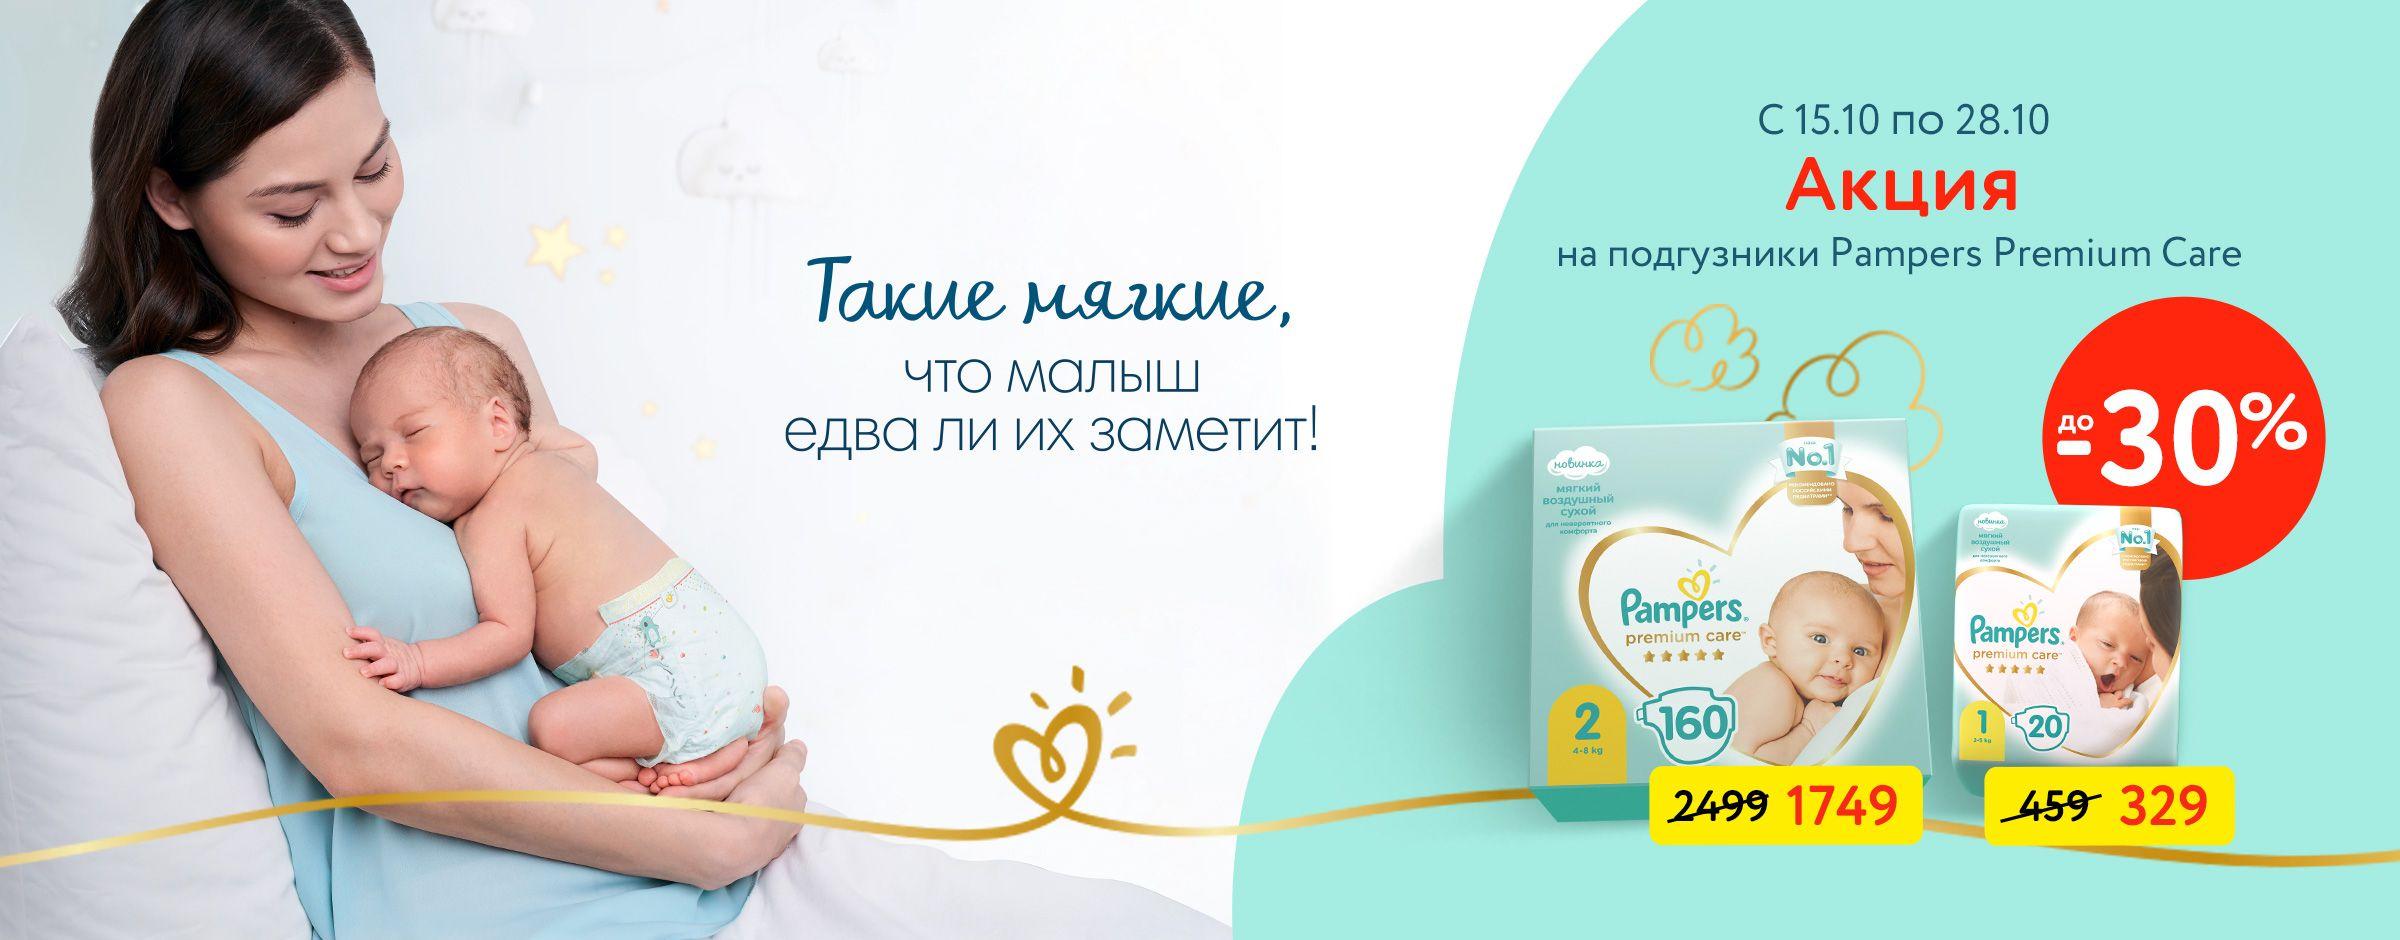 До 30% на подгузники Pampers Premium care Подгузники